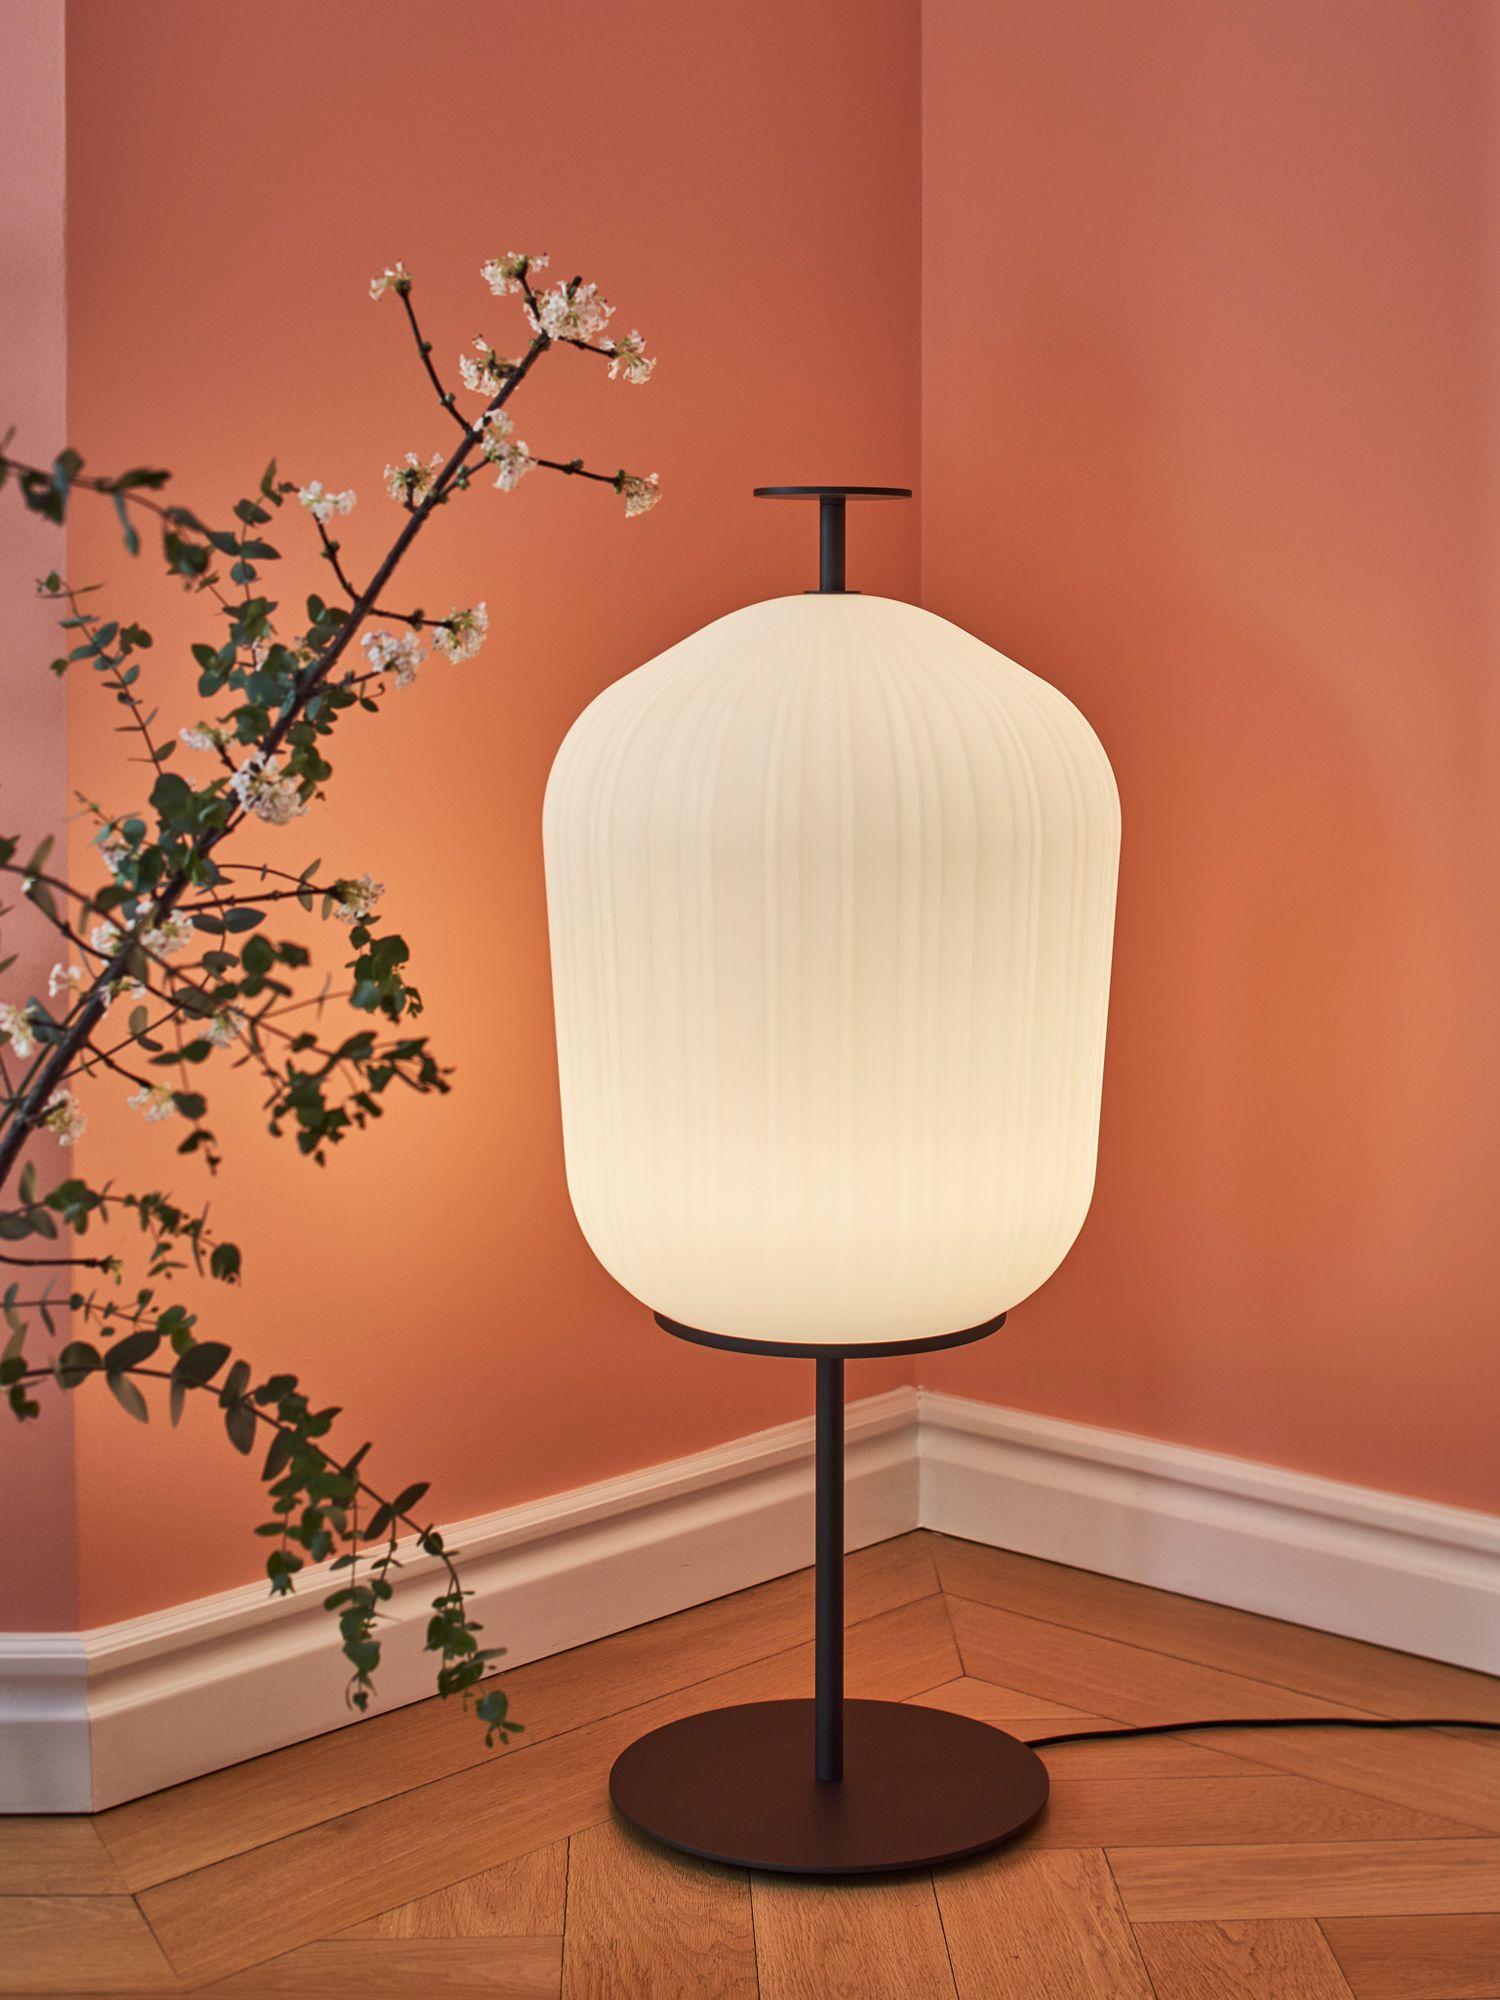 Classicon Plissée floor lamp by Sebastian Herkner, from Space Furniture